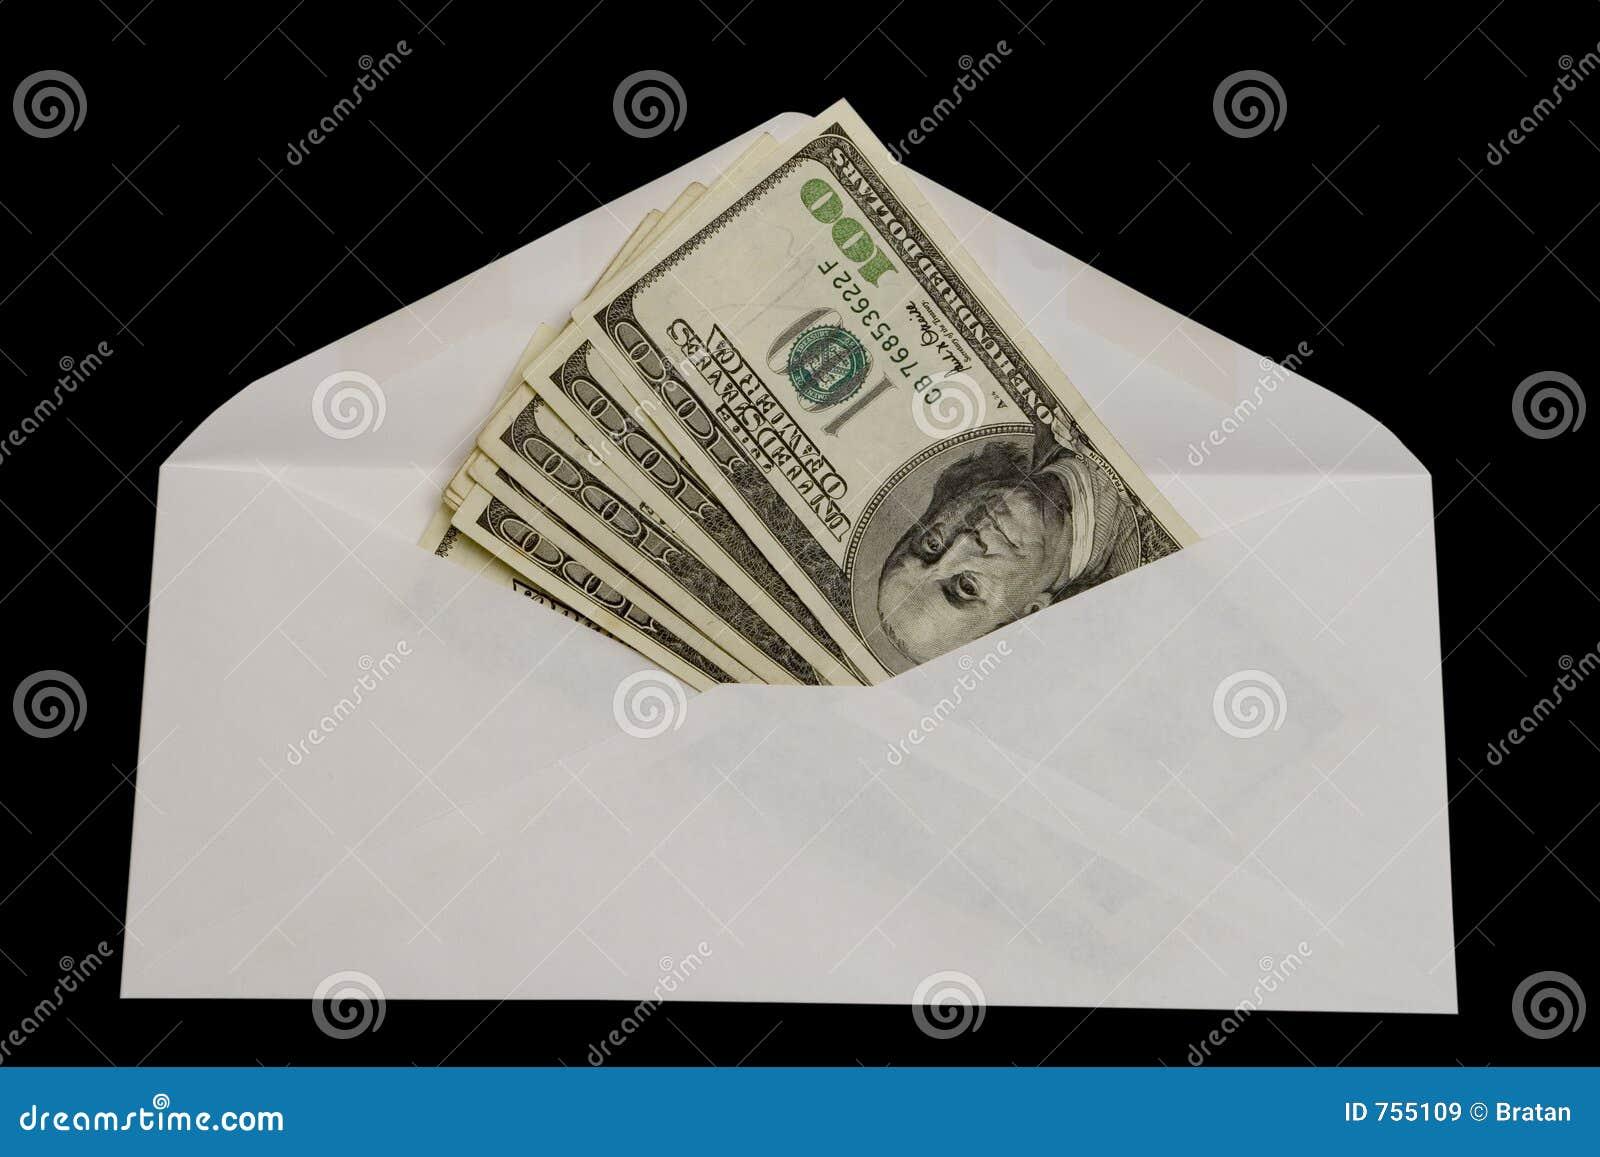 Send a money : Best type phone